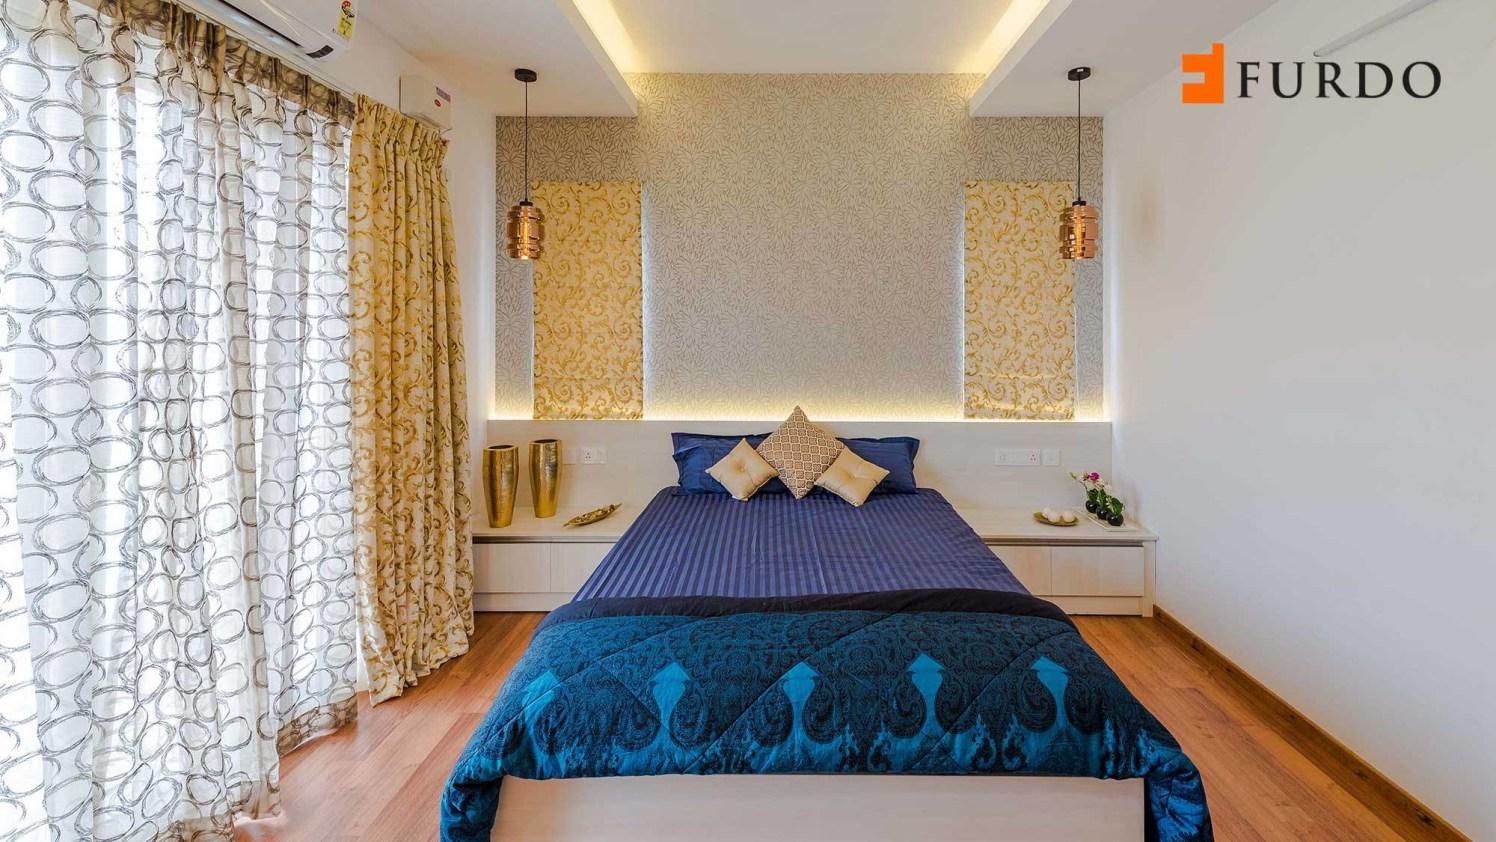 Bedroom With Wall Art And Wooden Flooring by Furdo.com Bedroom Contemporary | Interior Design Photos & Ideas